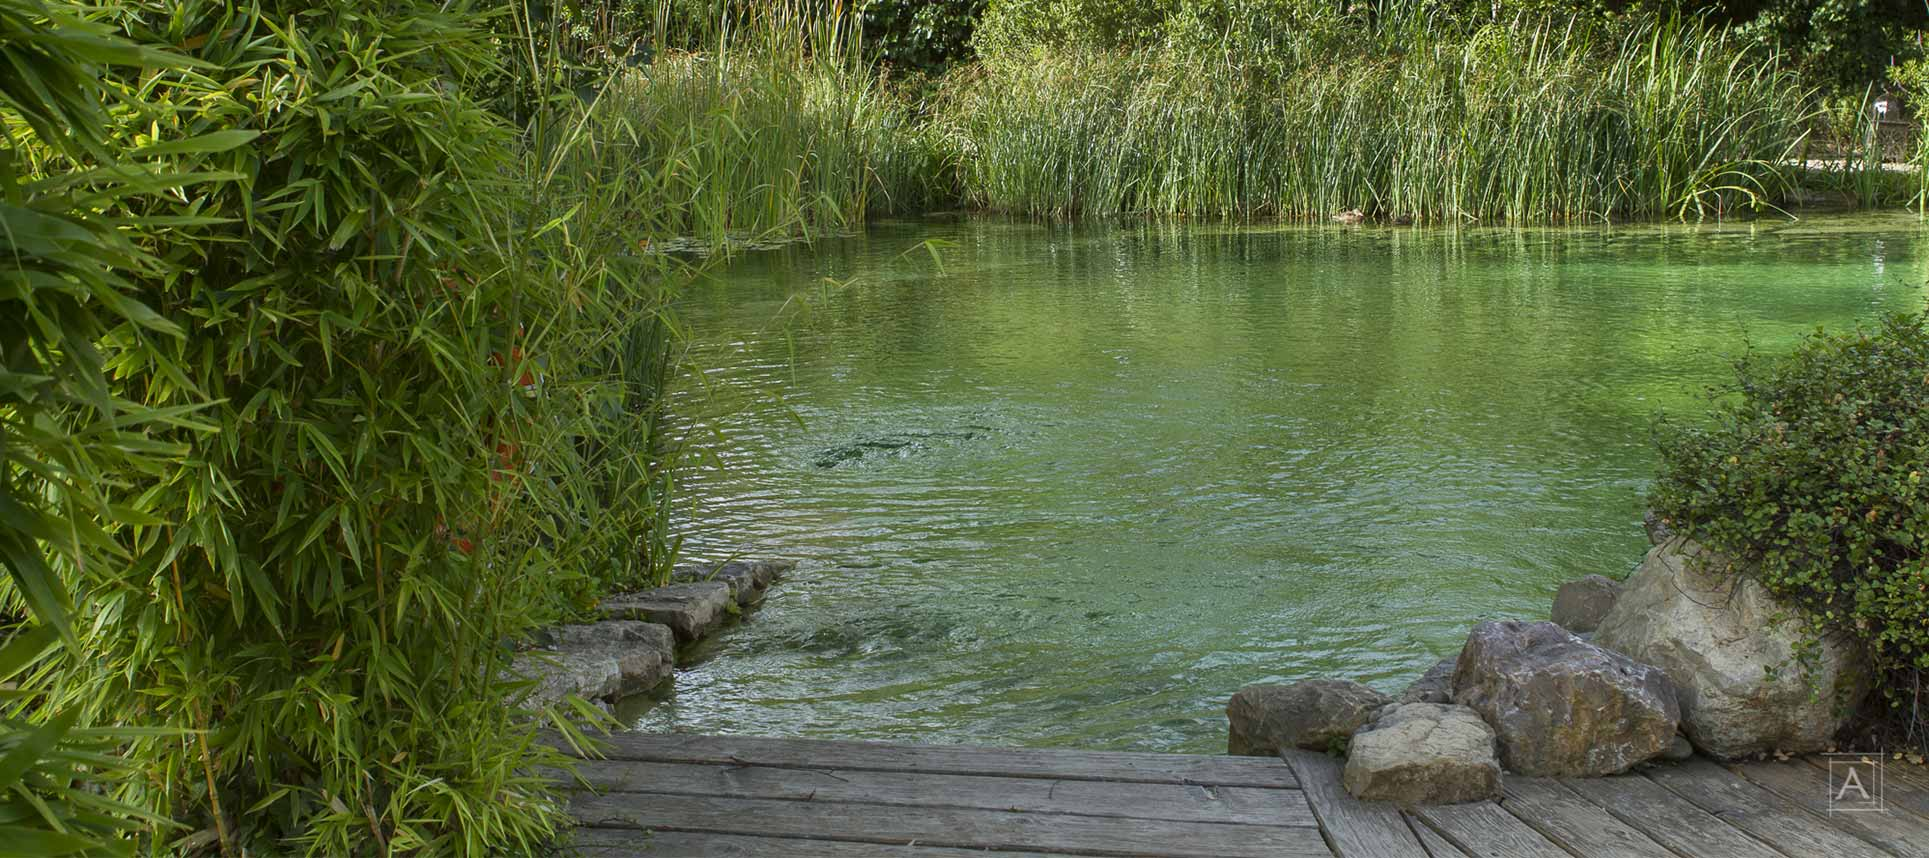 piscine-naturelle-terrasse-bois-couleur-nature